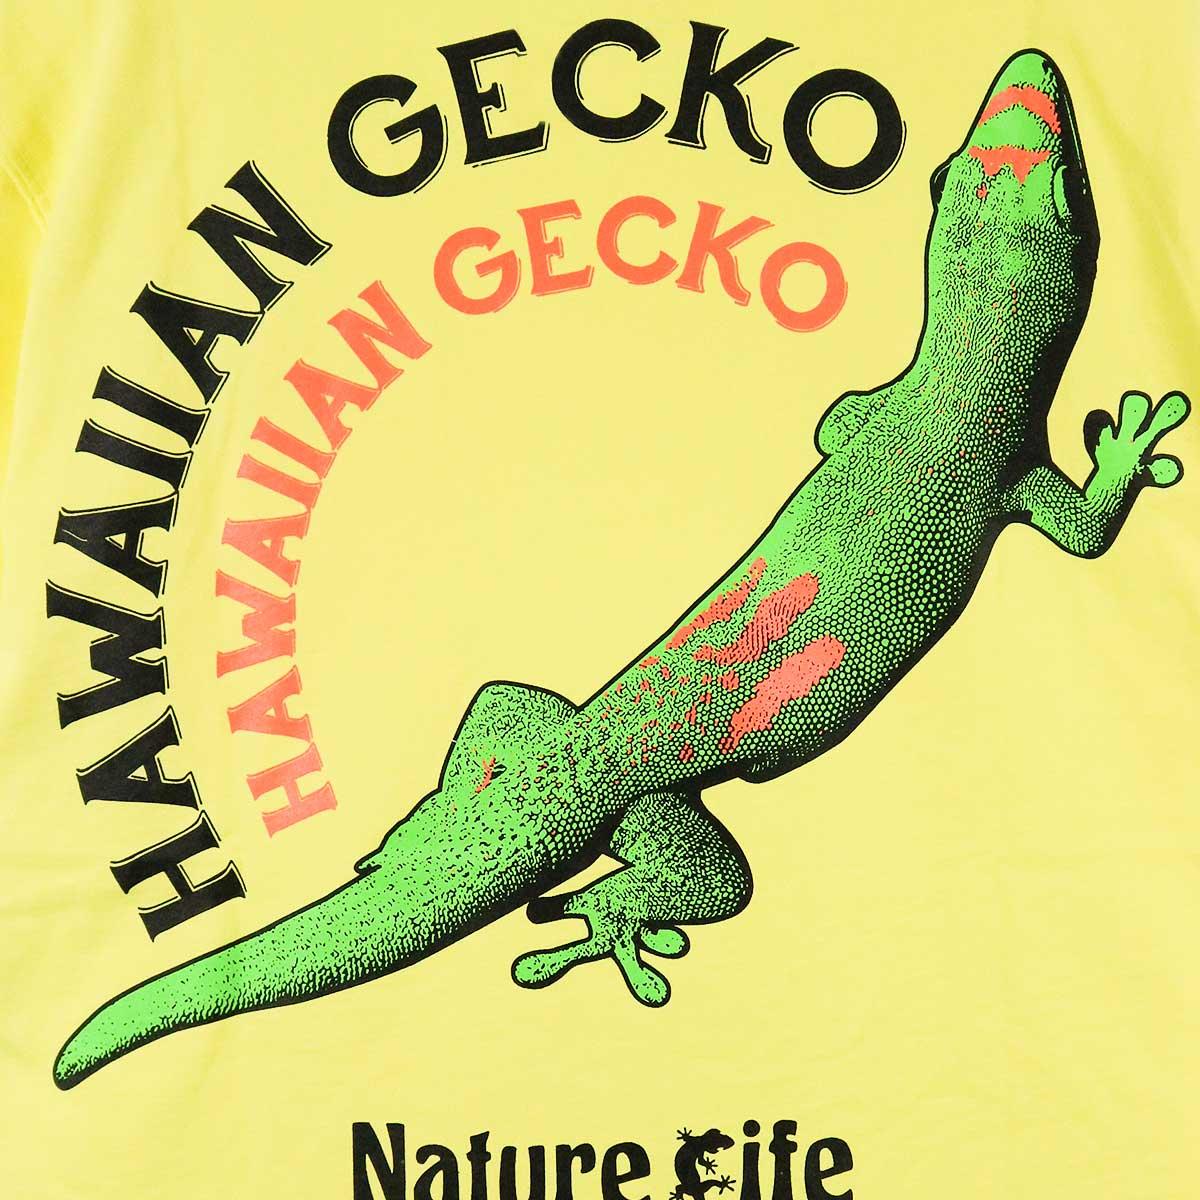 RBV GECKO POCKET T-SHIRT